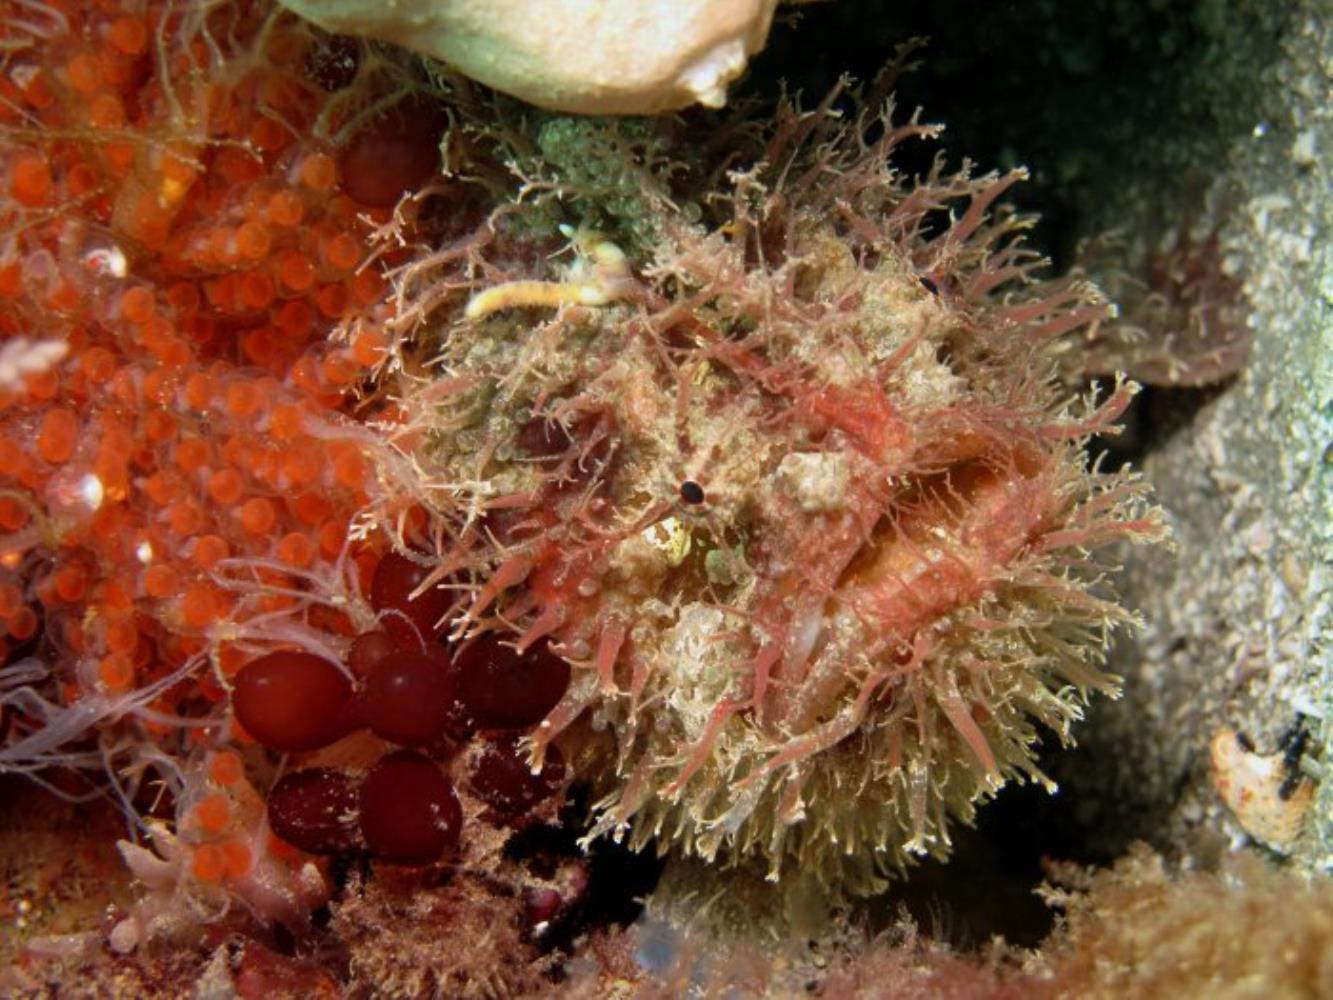 Tasseled Frogfish